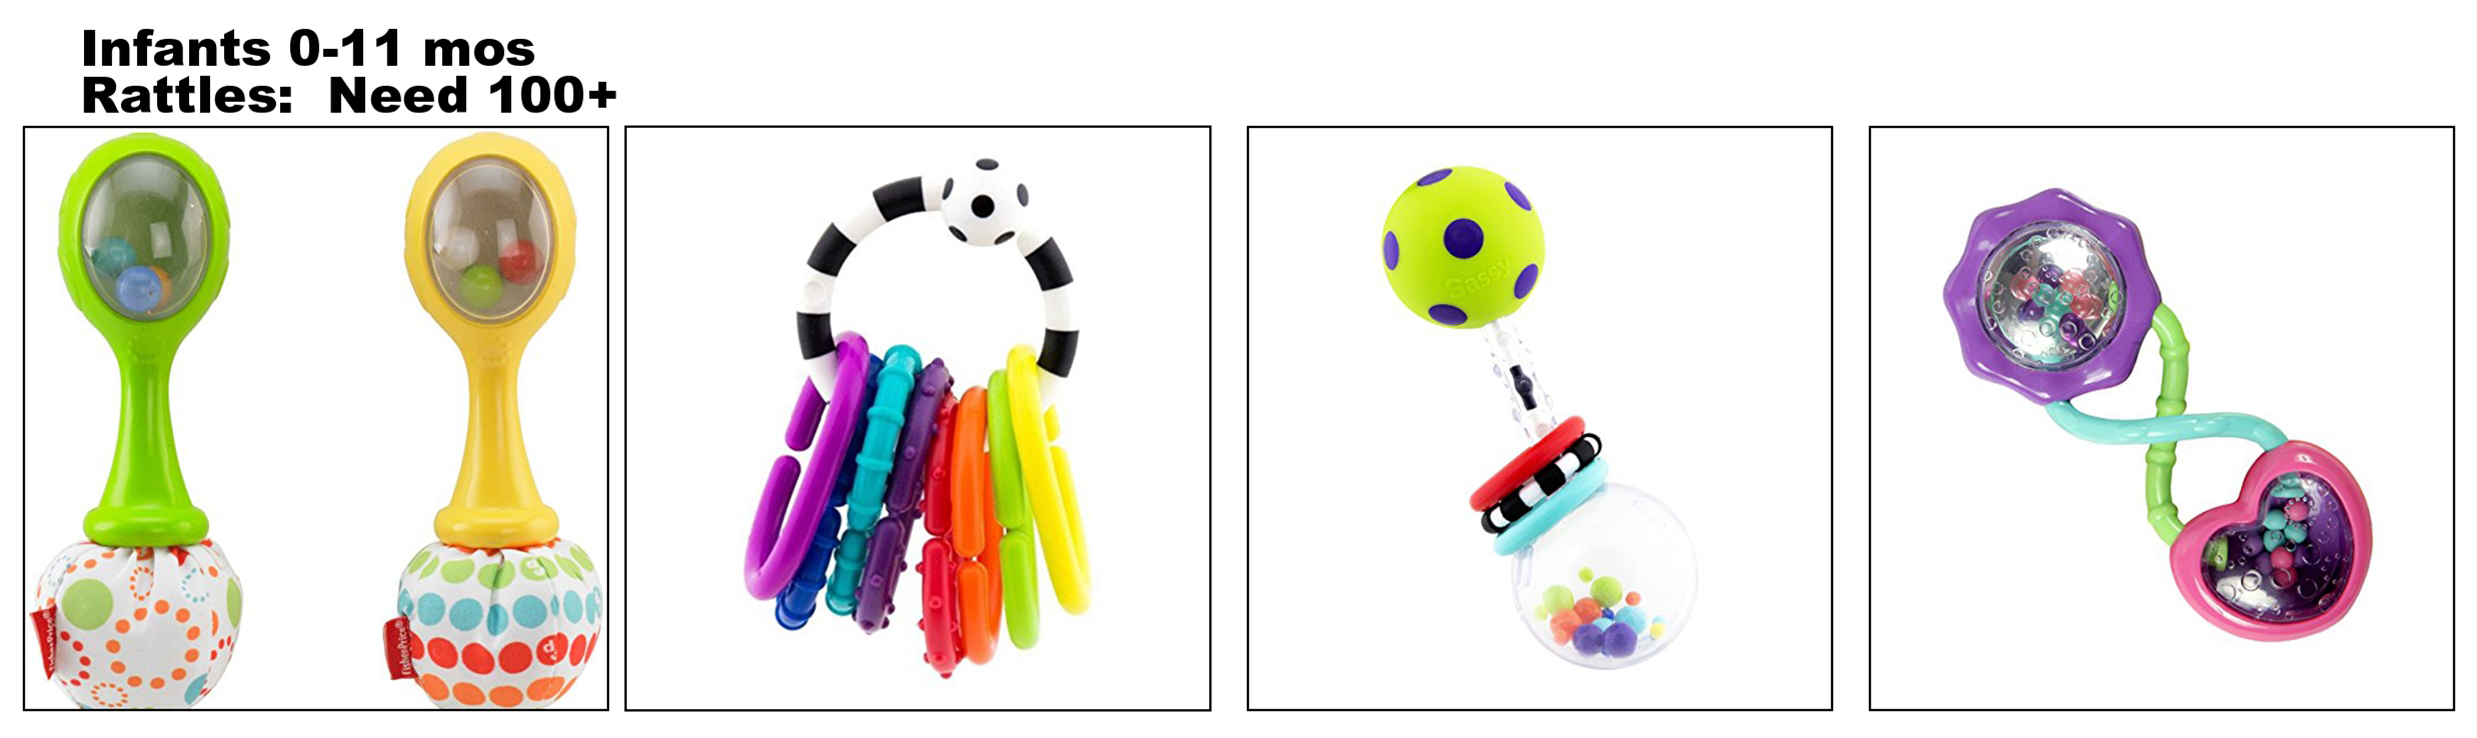 Toy+Drive+Infants+0-11+mos.jpg